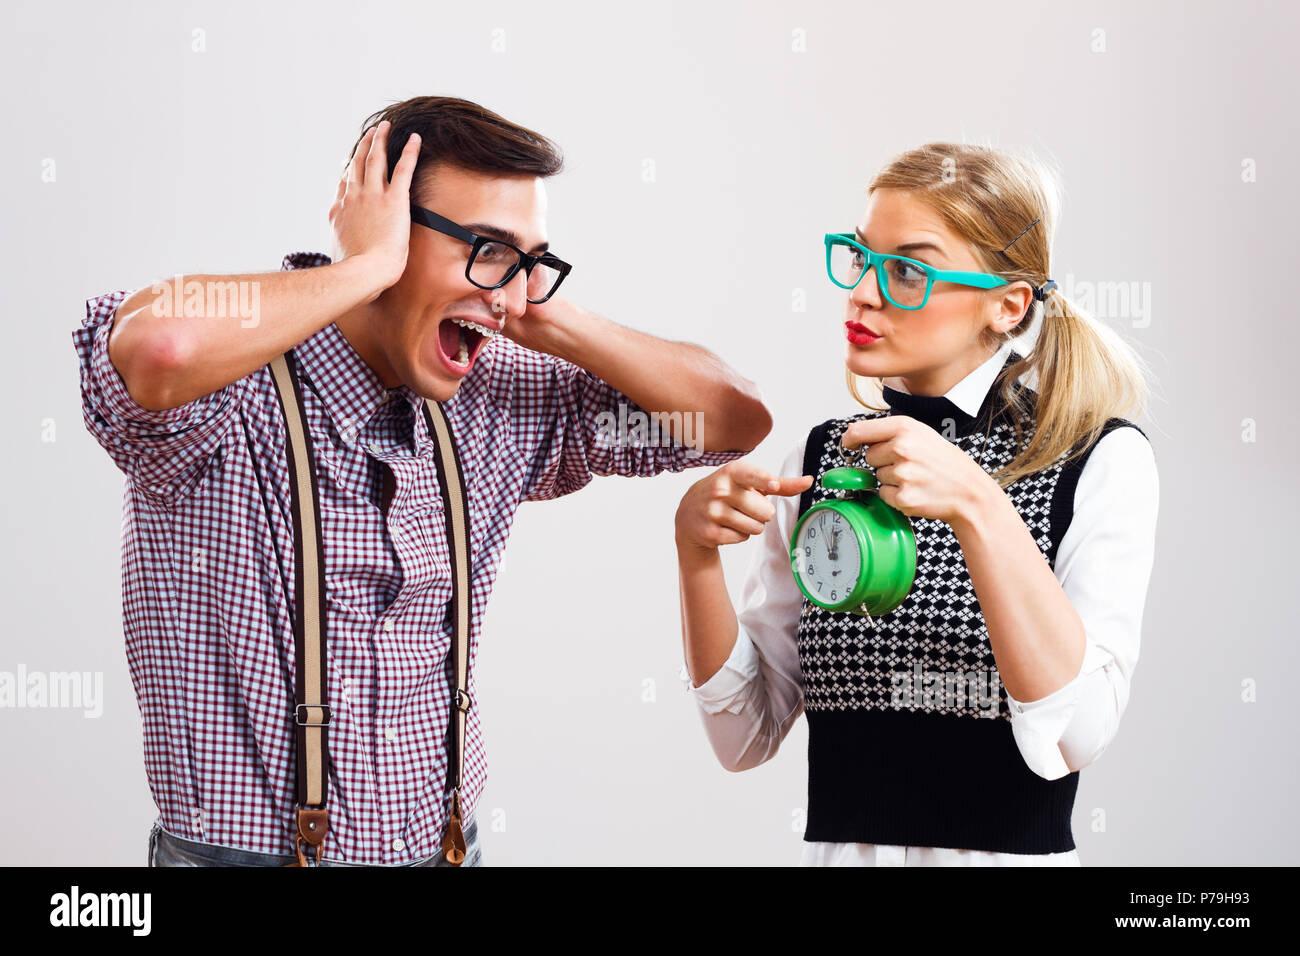 Nerdy woman showing clock to her nerdy boyfriend. - Stock Image